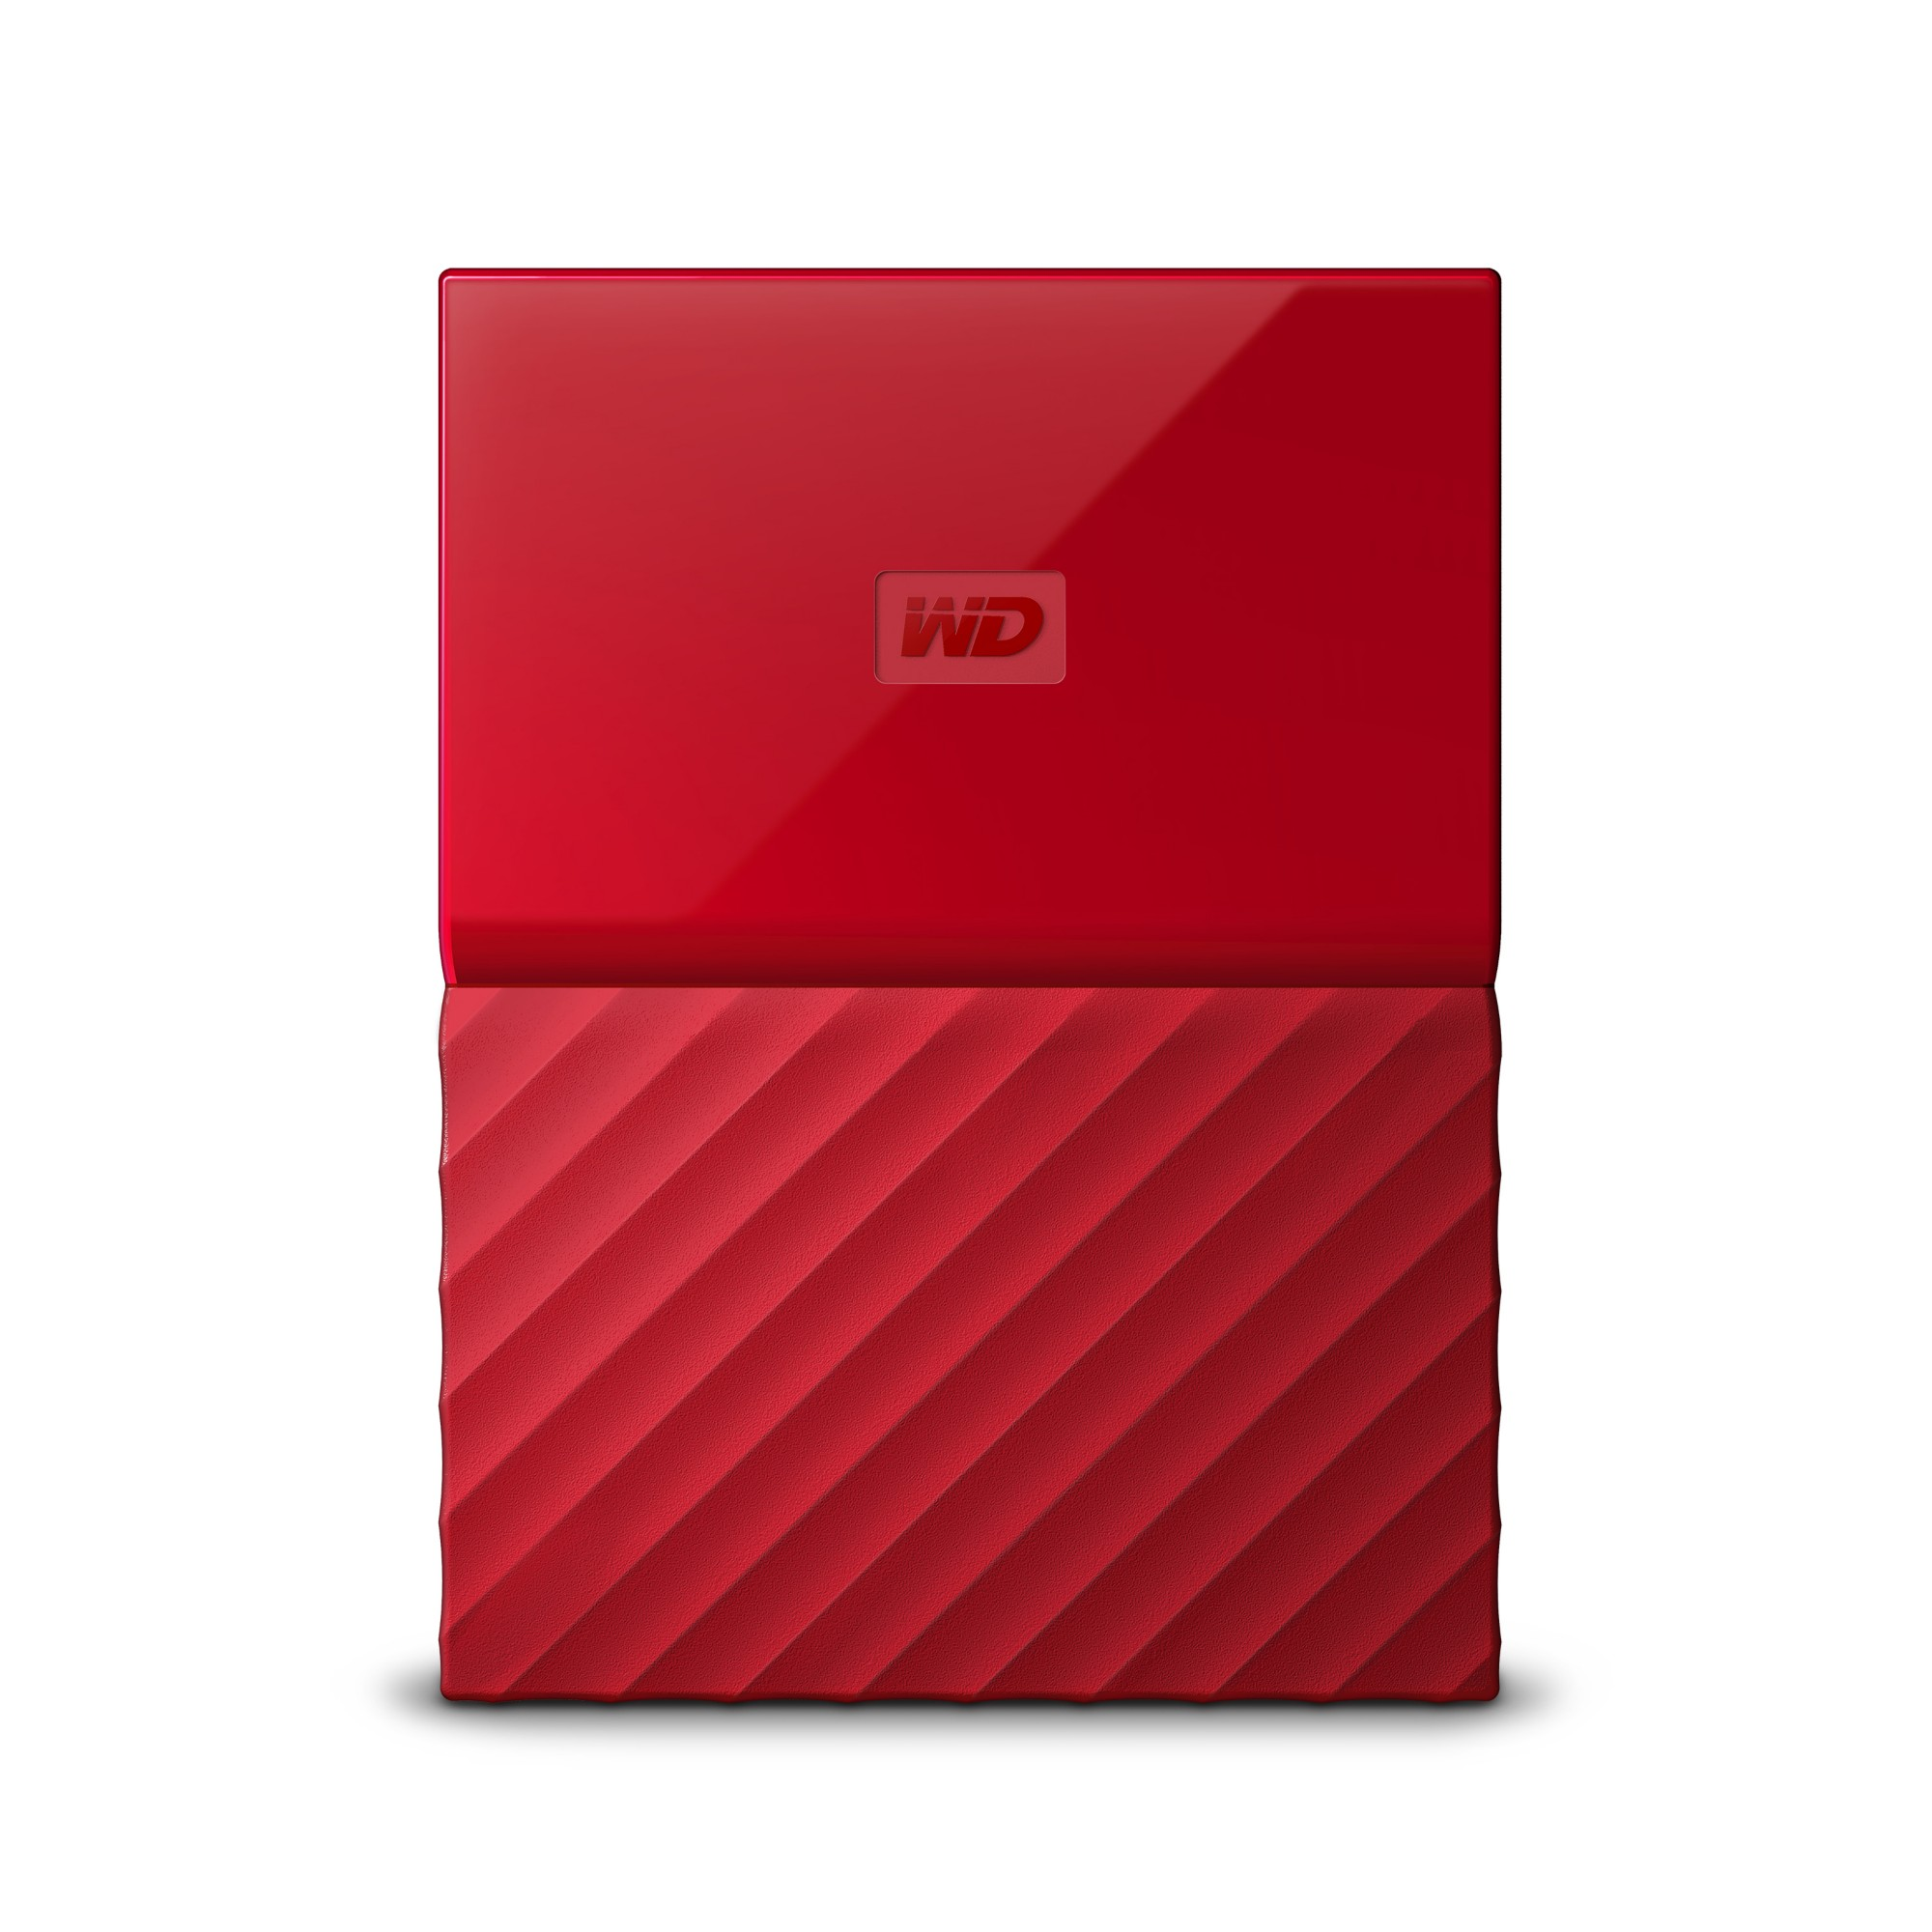 Western Digital My Passport external hard drive 1000 GB Red